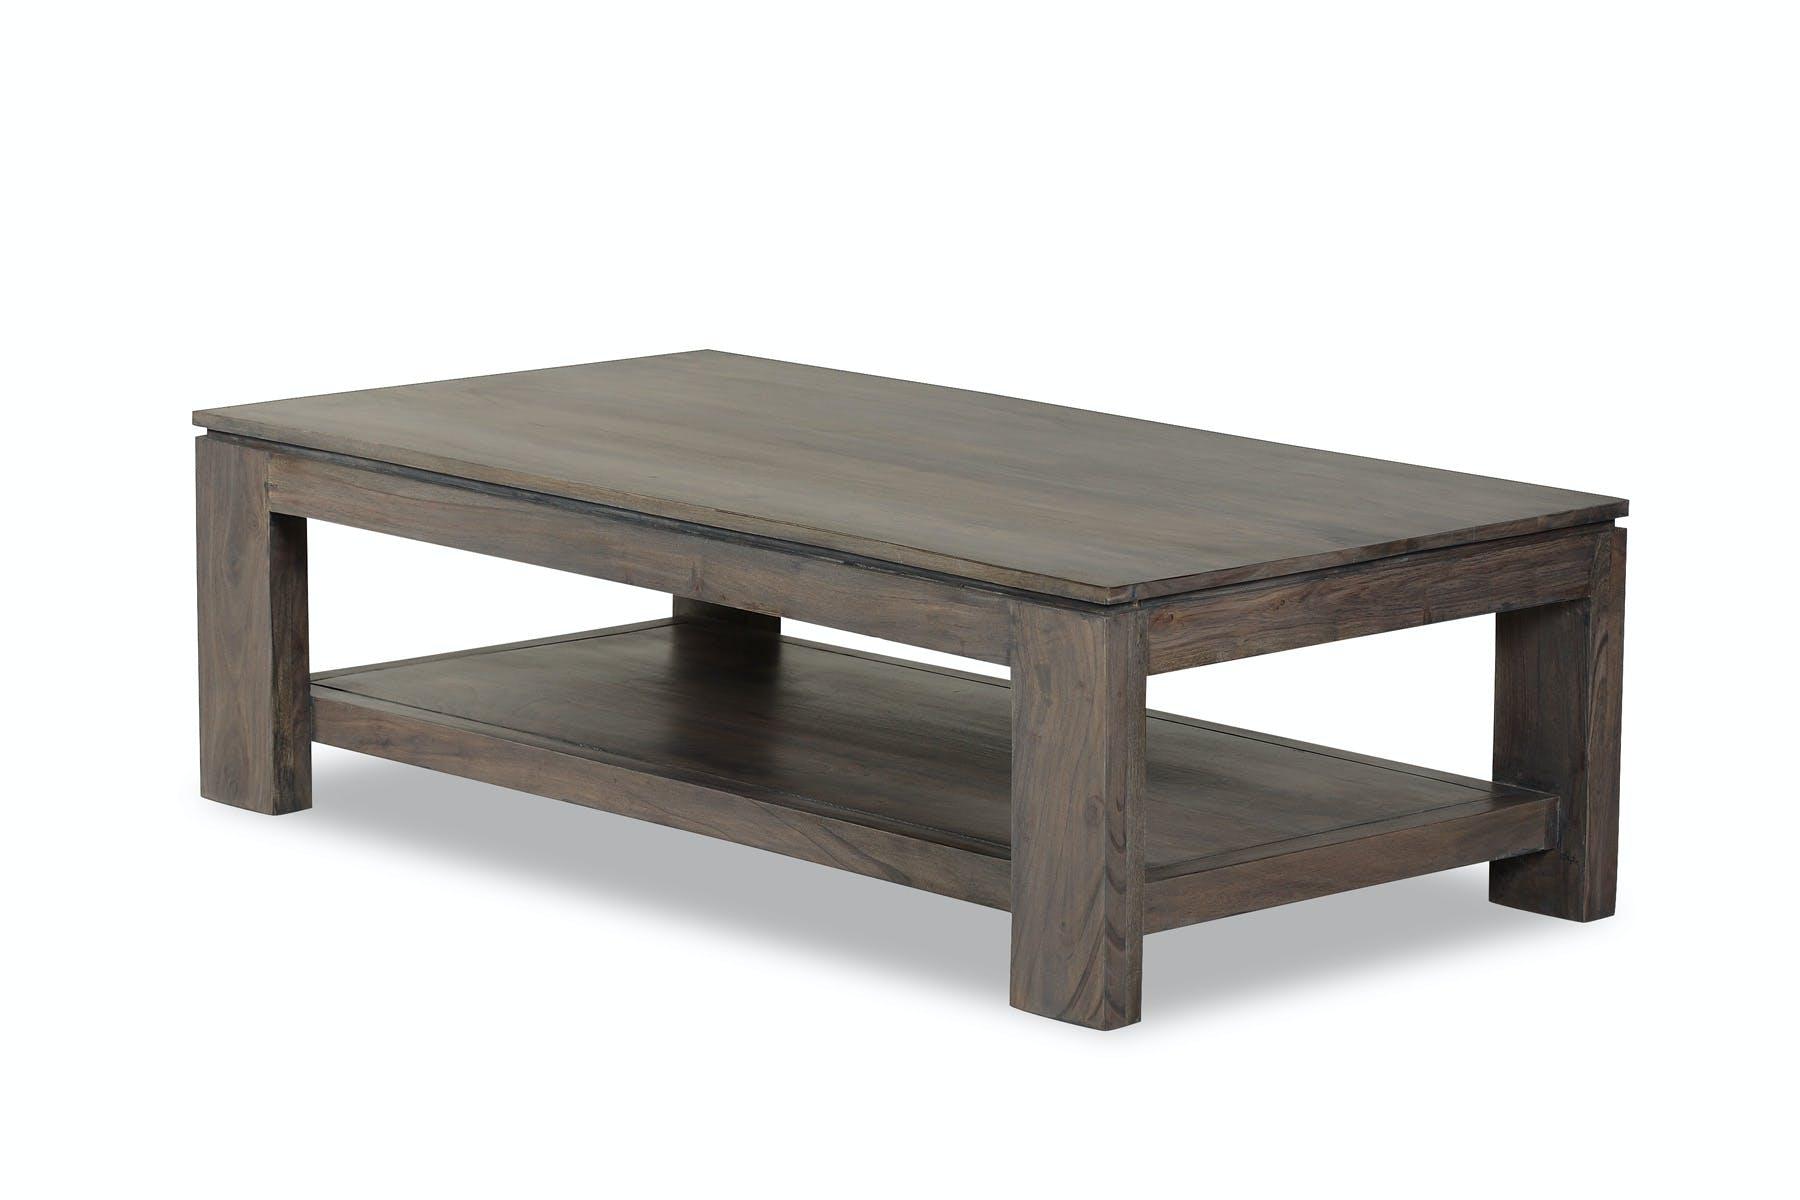 Table basse rect 130x70cm BOREAL acacia grisé